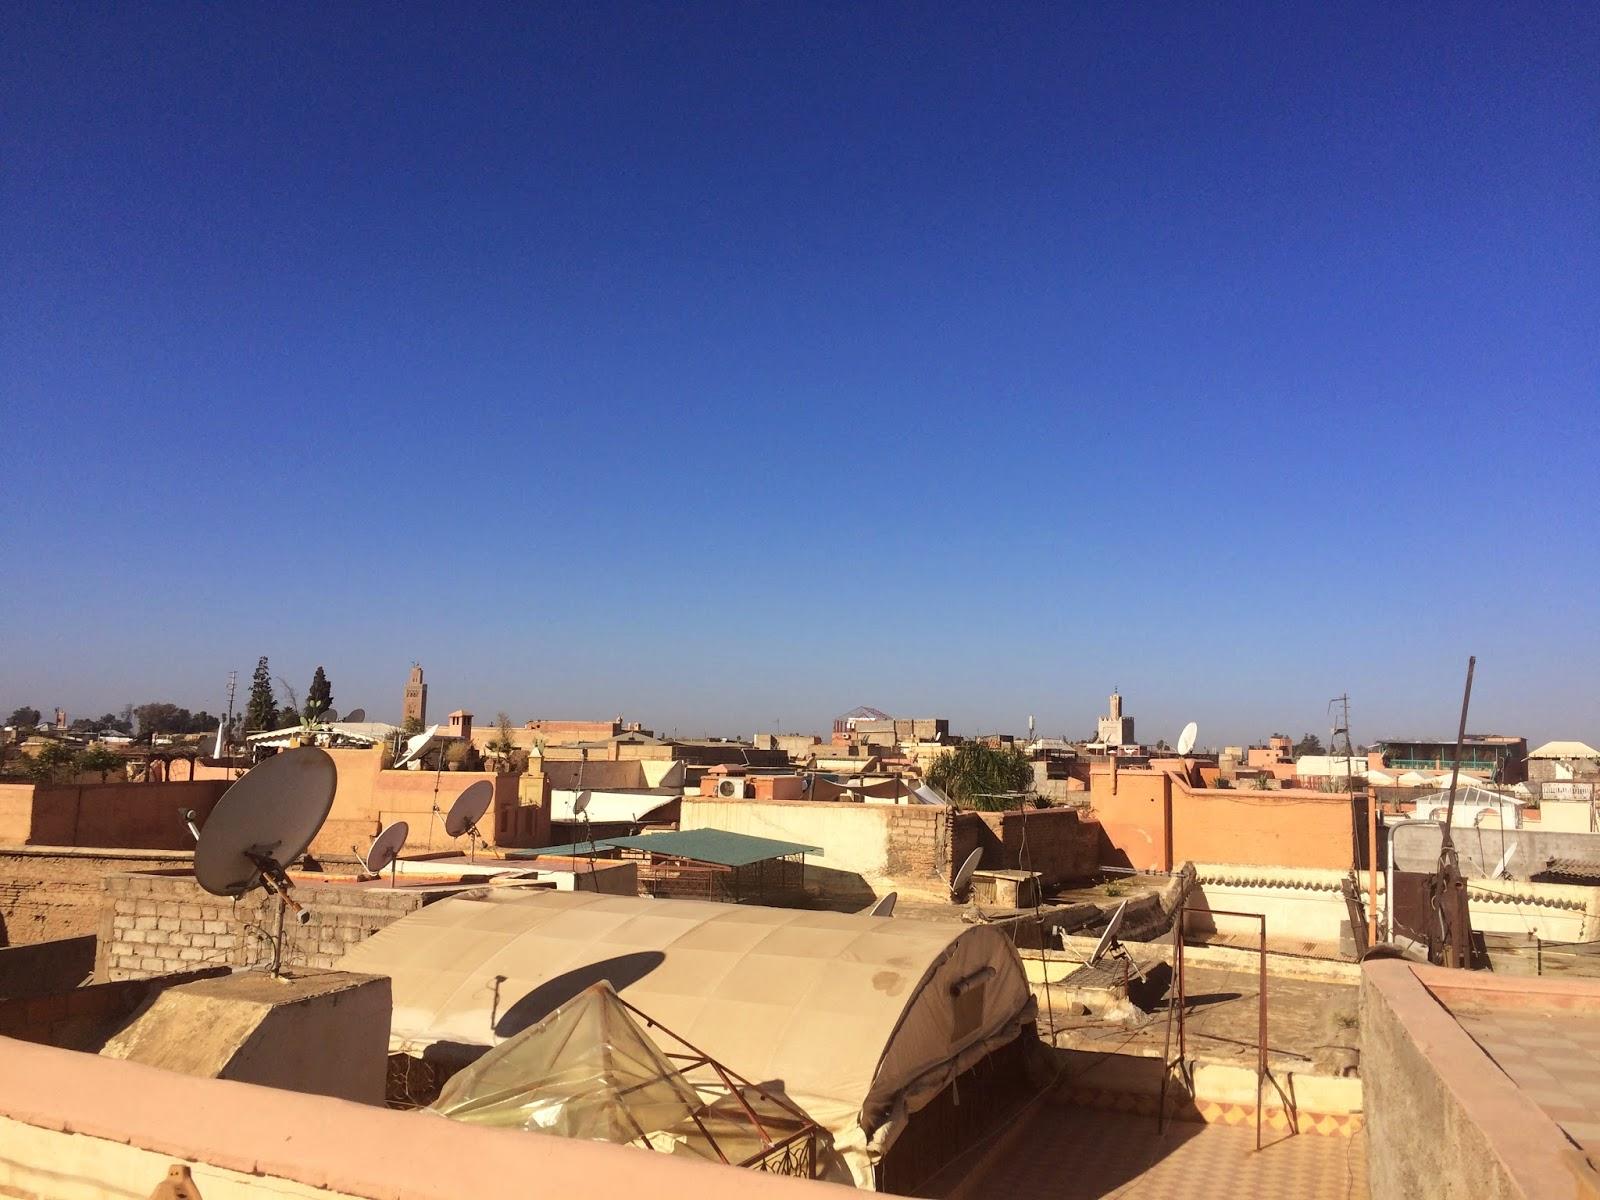 marrakech-morocco-maroc-sky